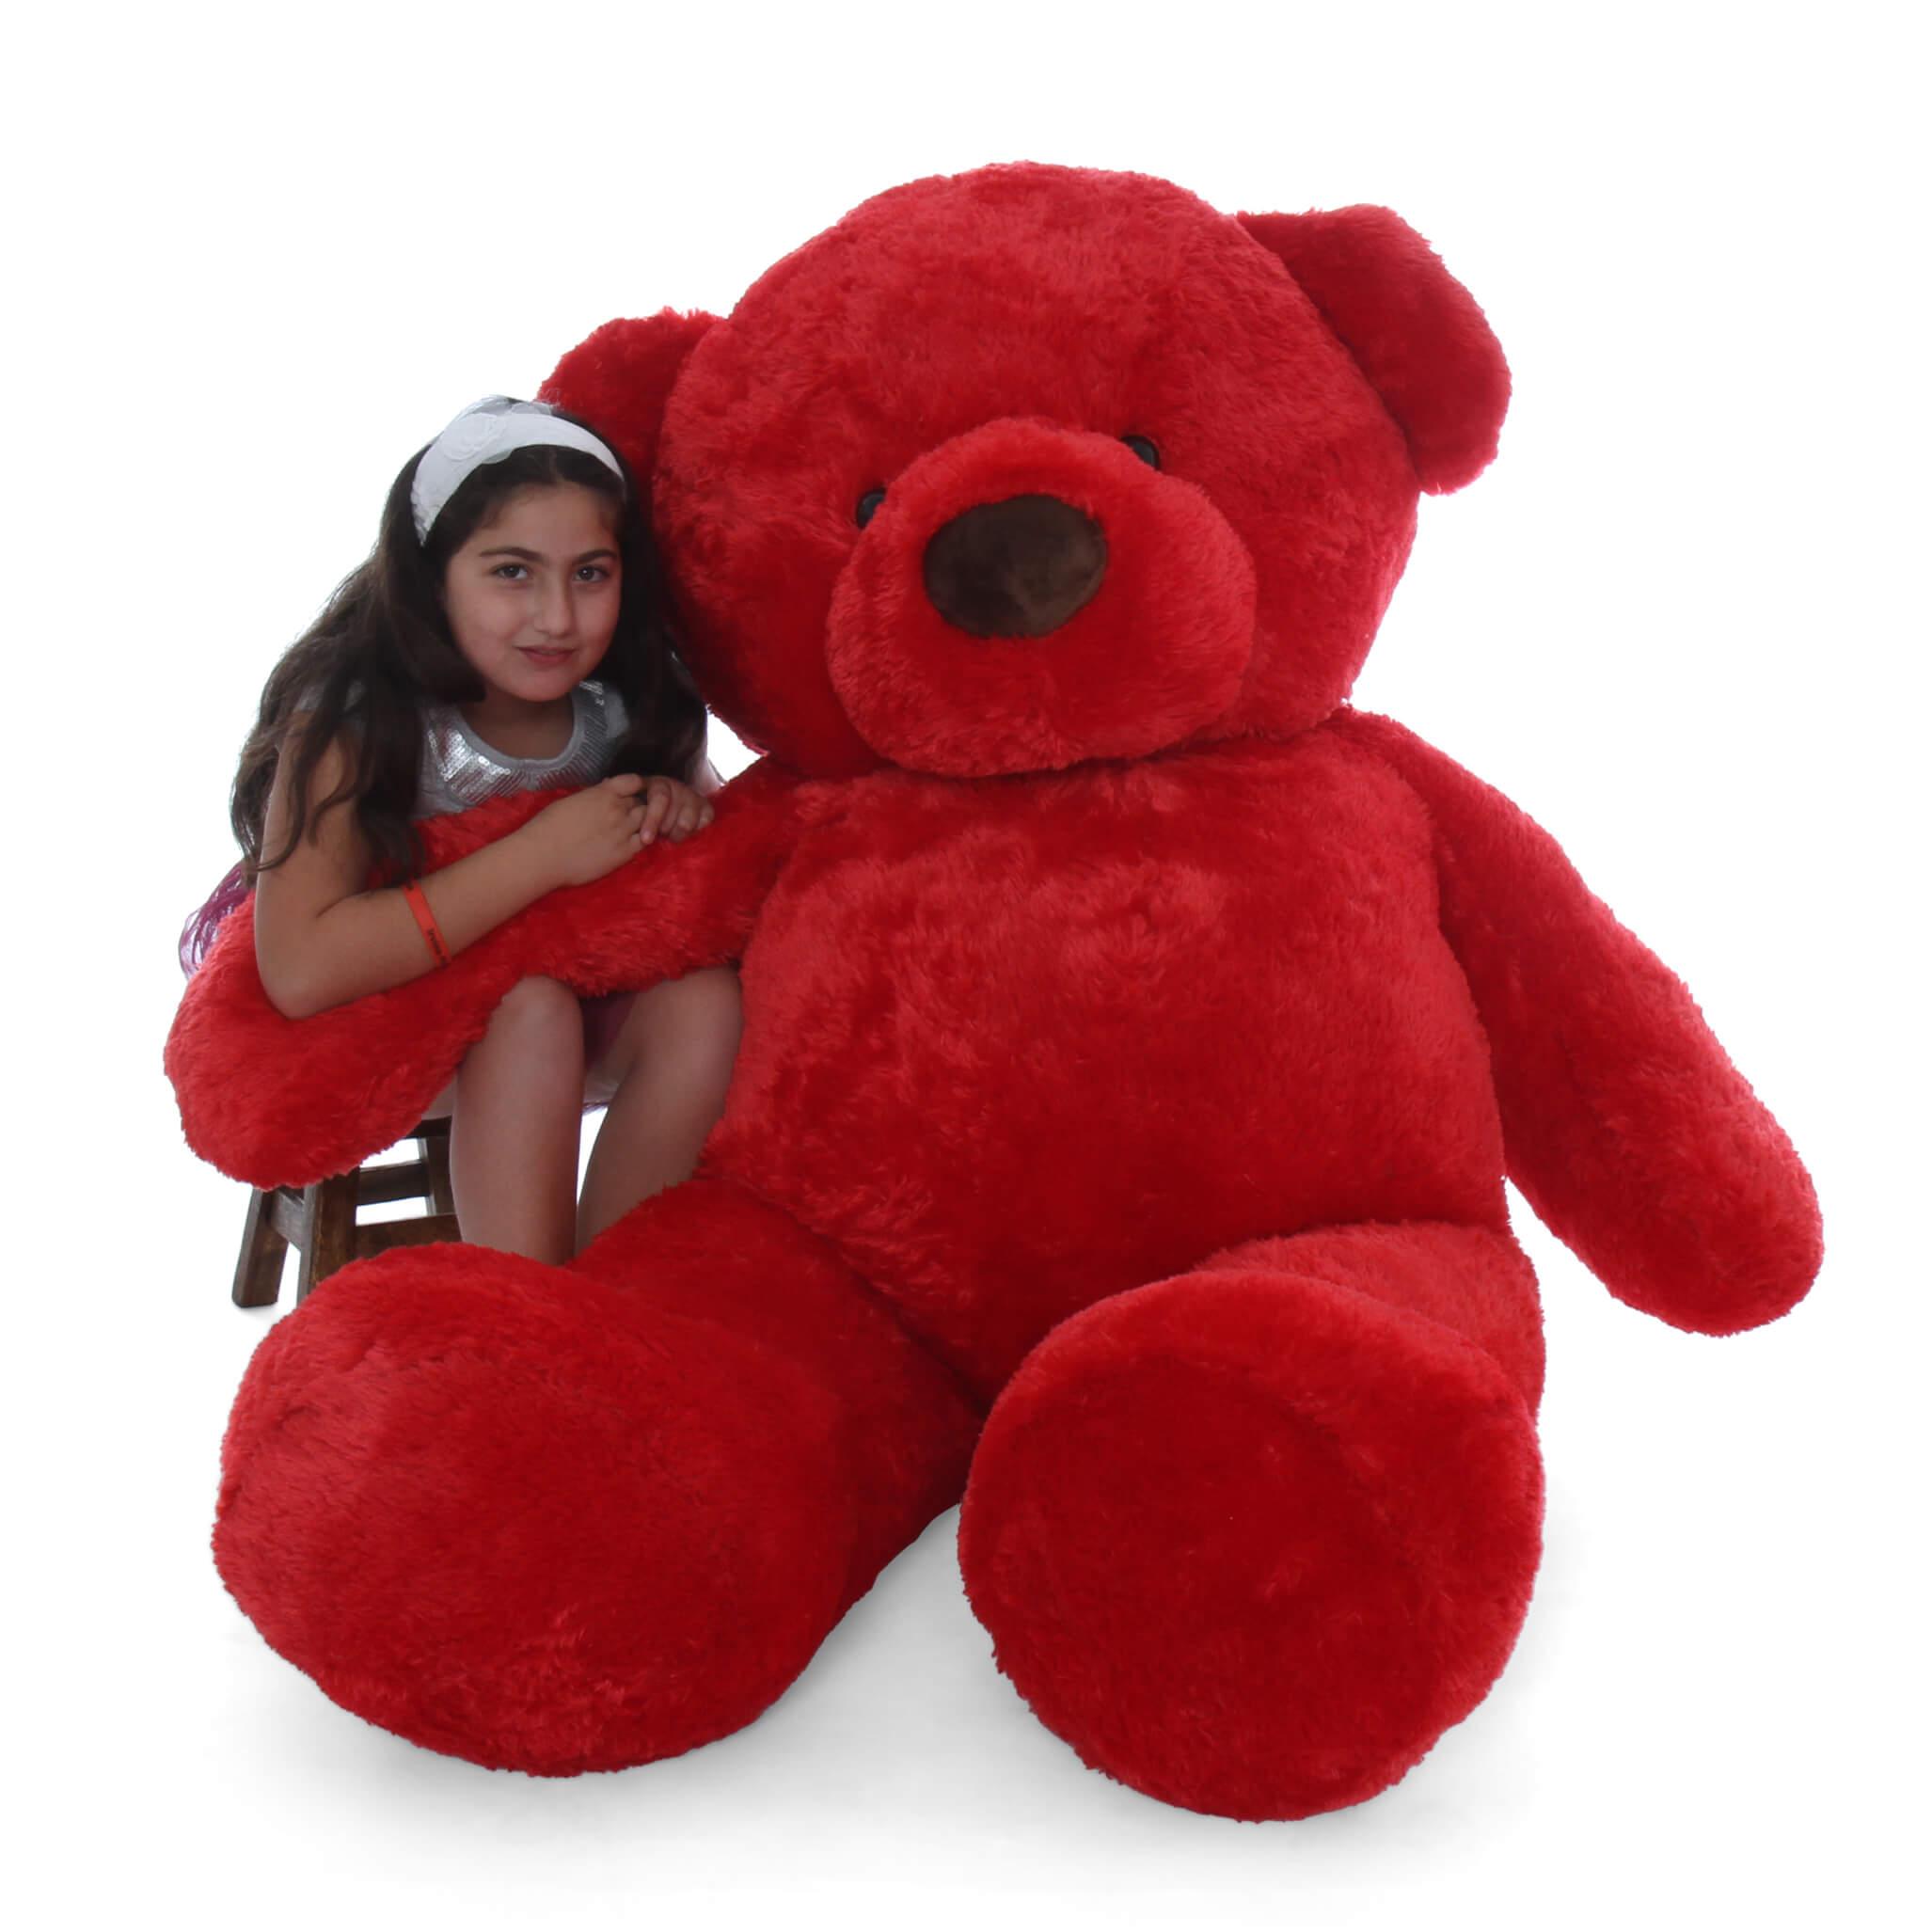 life-size-72in-humongous-red-teddy-bear-riley-chubs-by-giant-teddy-1.jpg